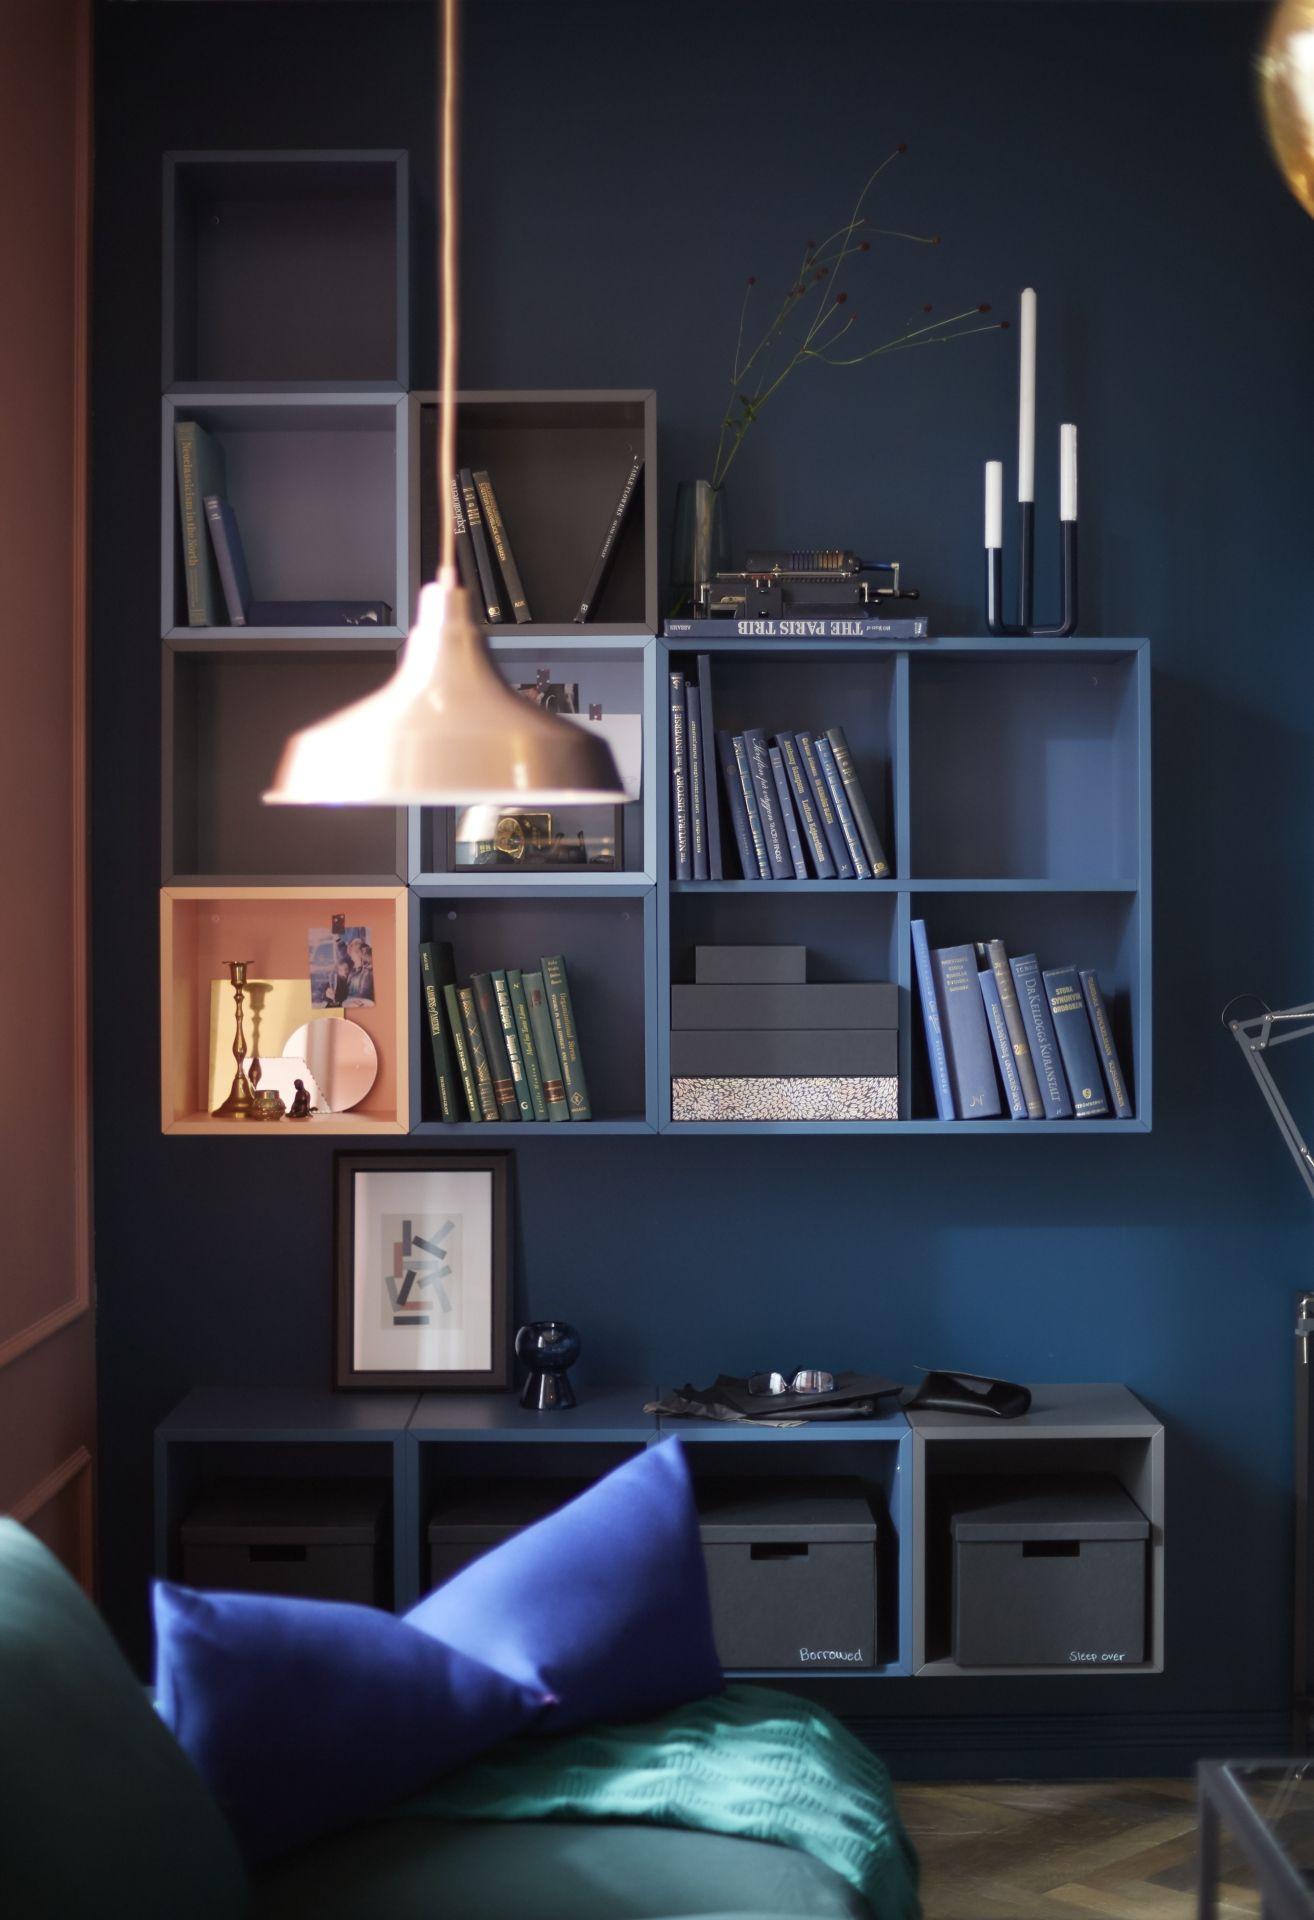 eket kastencombinatie voor wandmontage veelkleurig wall mount ikea eket and interiors. Black Bedroom Furniture Sets. Home Design Ideas